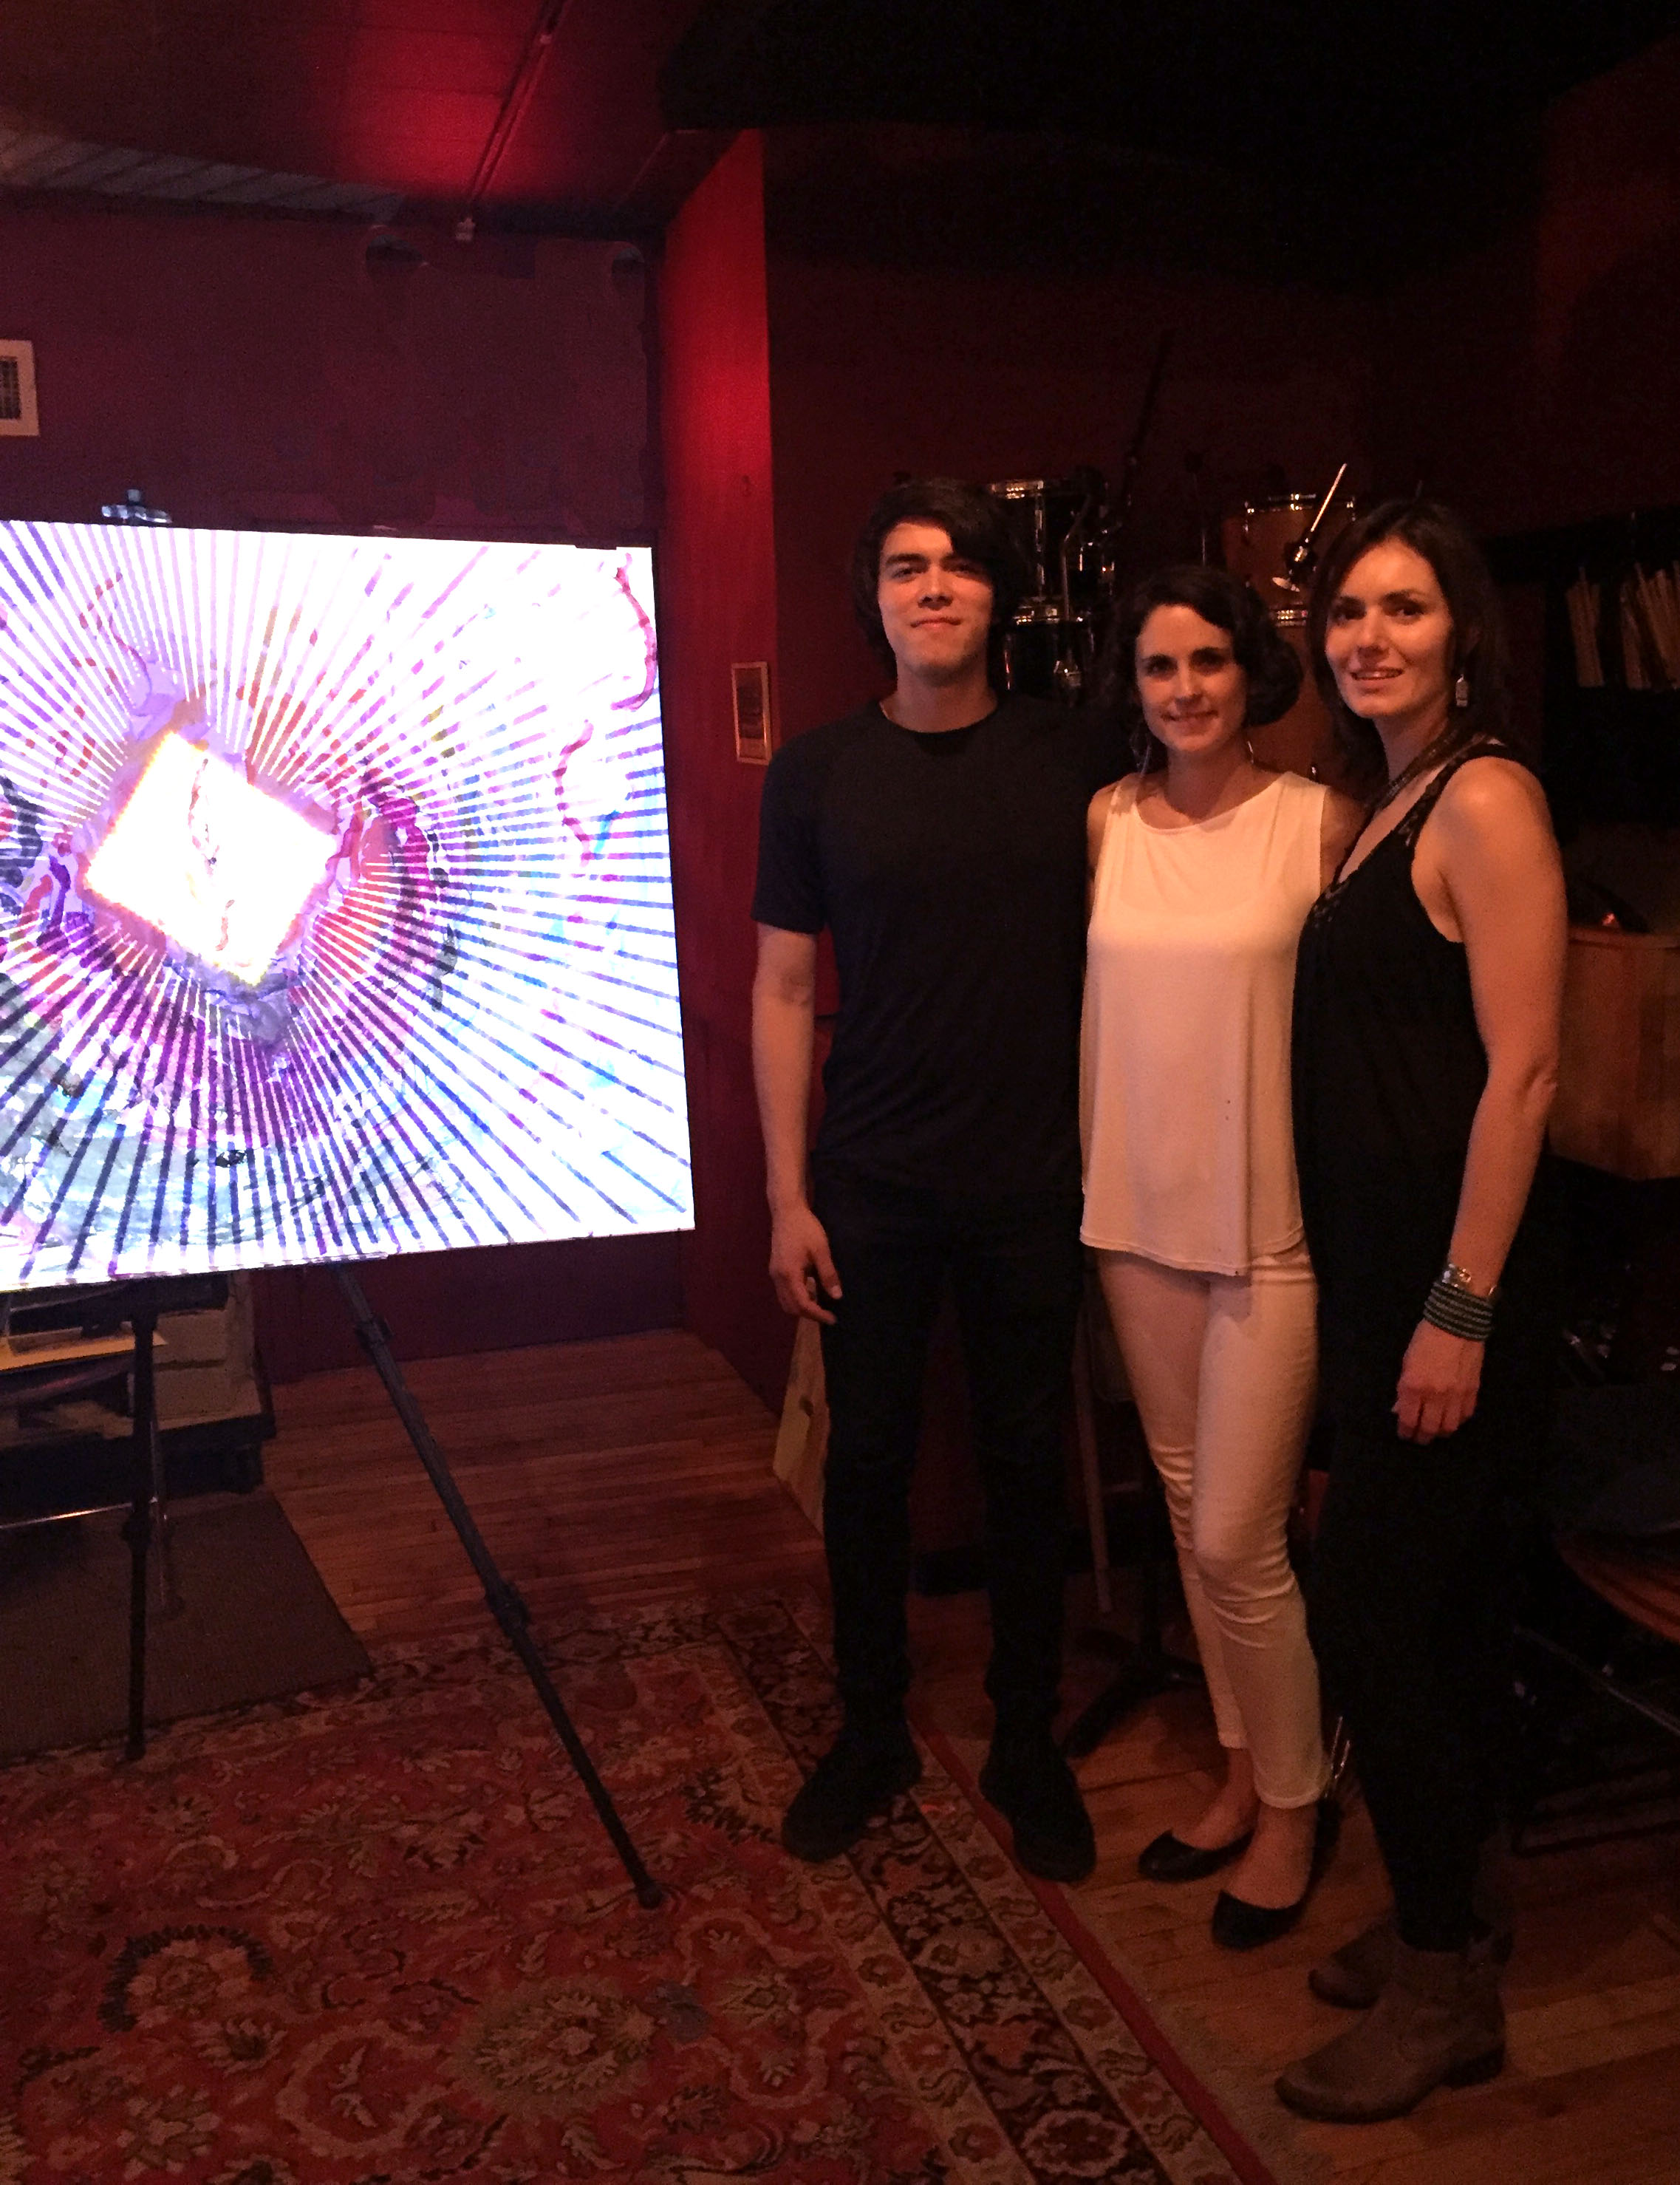 Olga Kisseleva, Alejandro Gonzalez, and Fotini Christophillis, Birth Performance Aug 4, 2017 @ Lilypad, Cambridge.